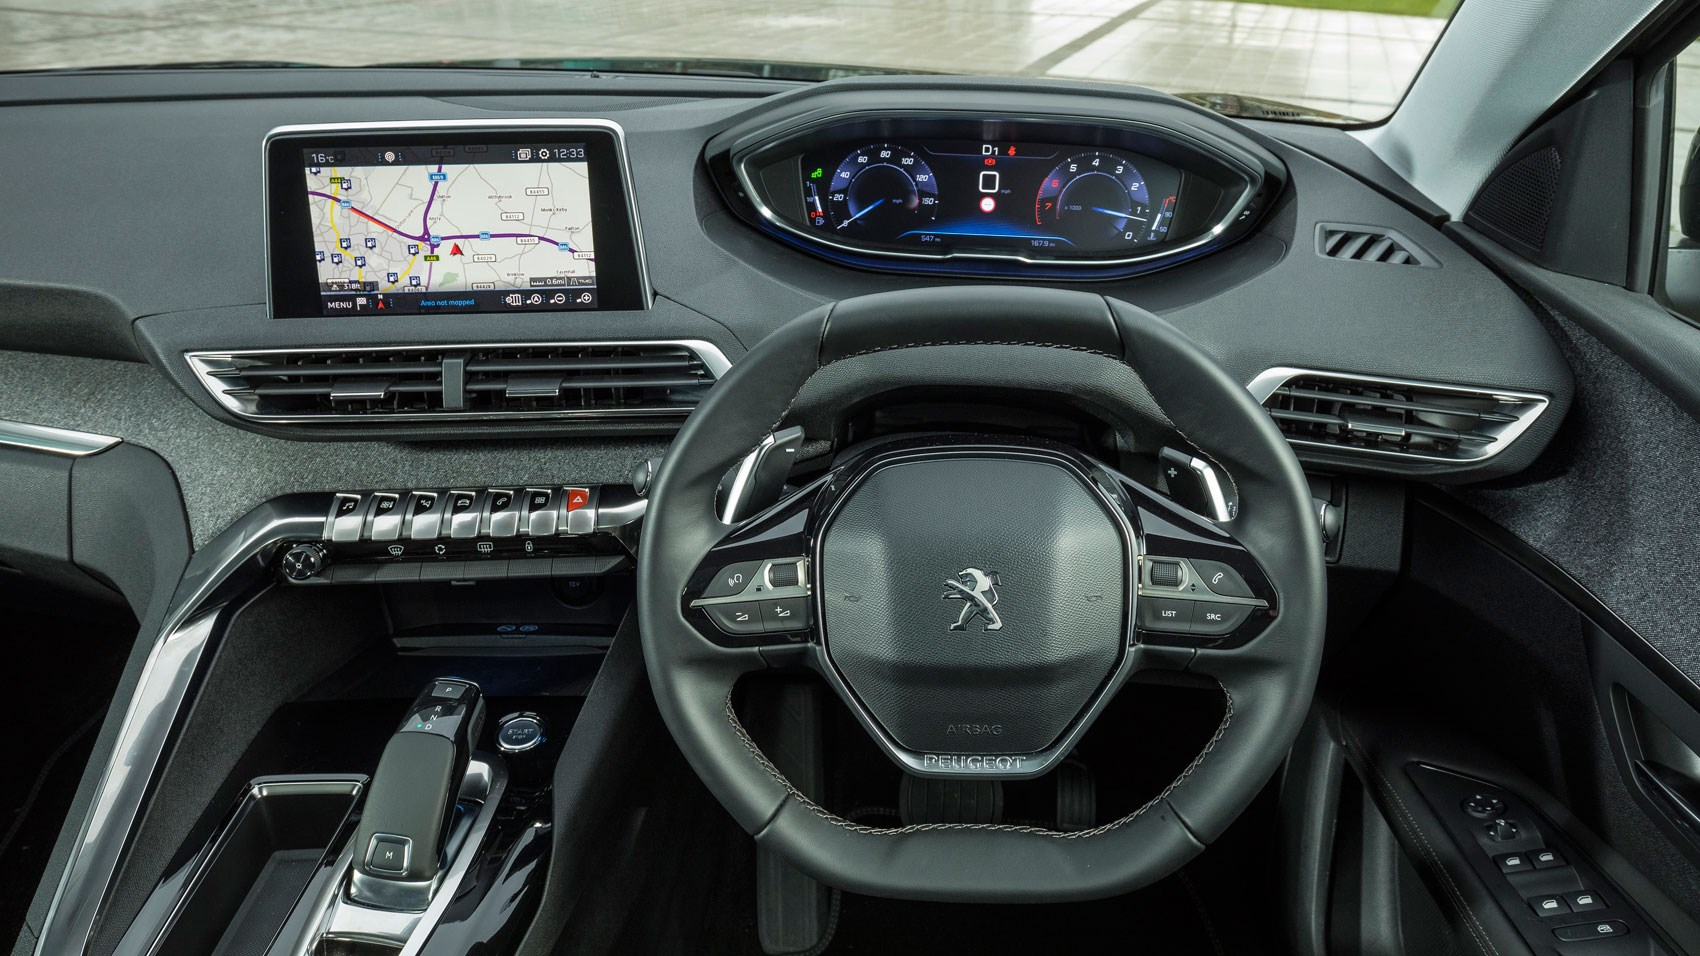 Peugeot 3008 16 Thp 165 Eat6 Allure 2017 Review Car Magazine 306 D Turbo Fuse Box Diagram